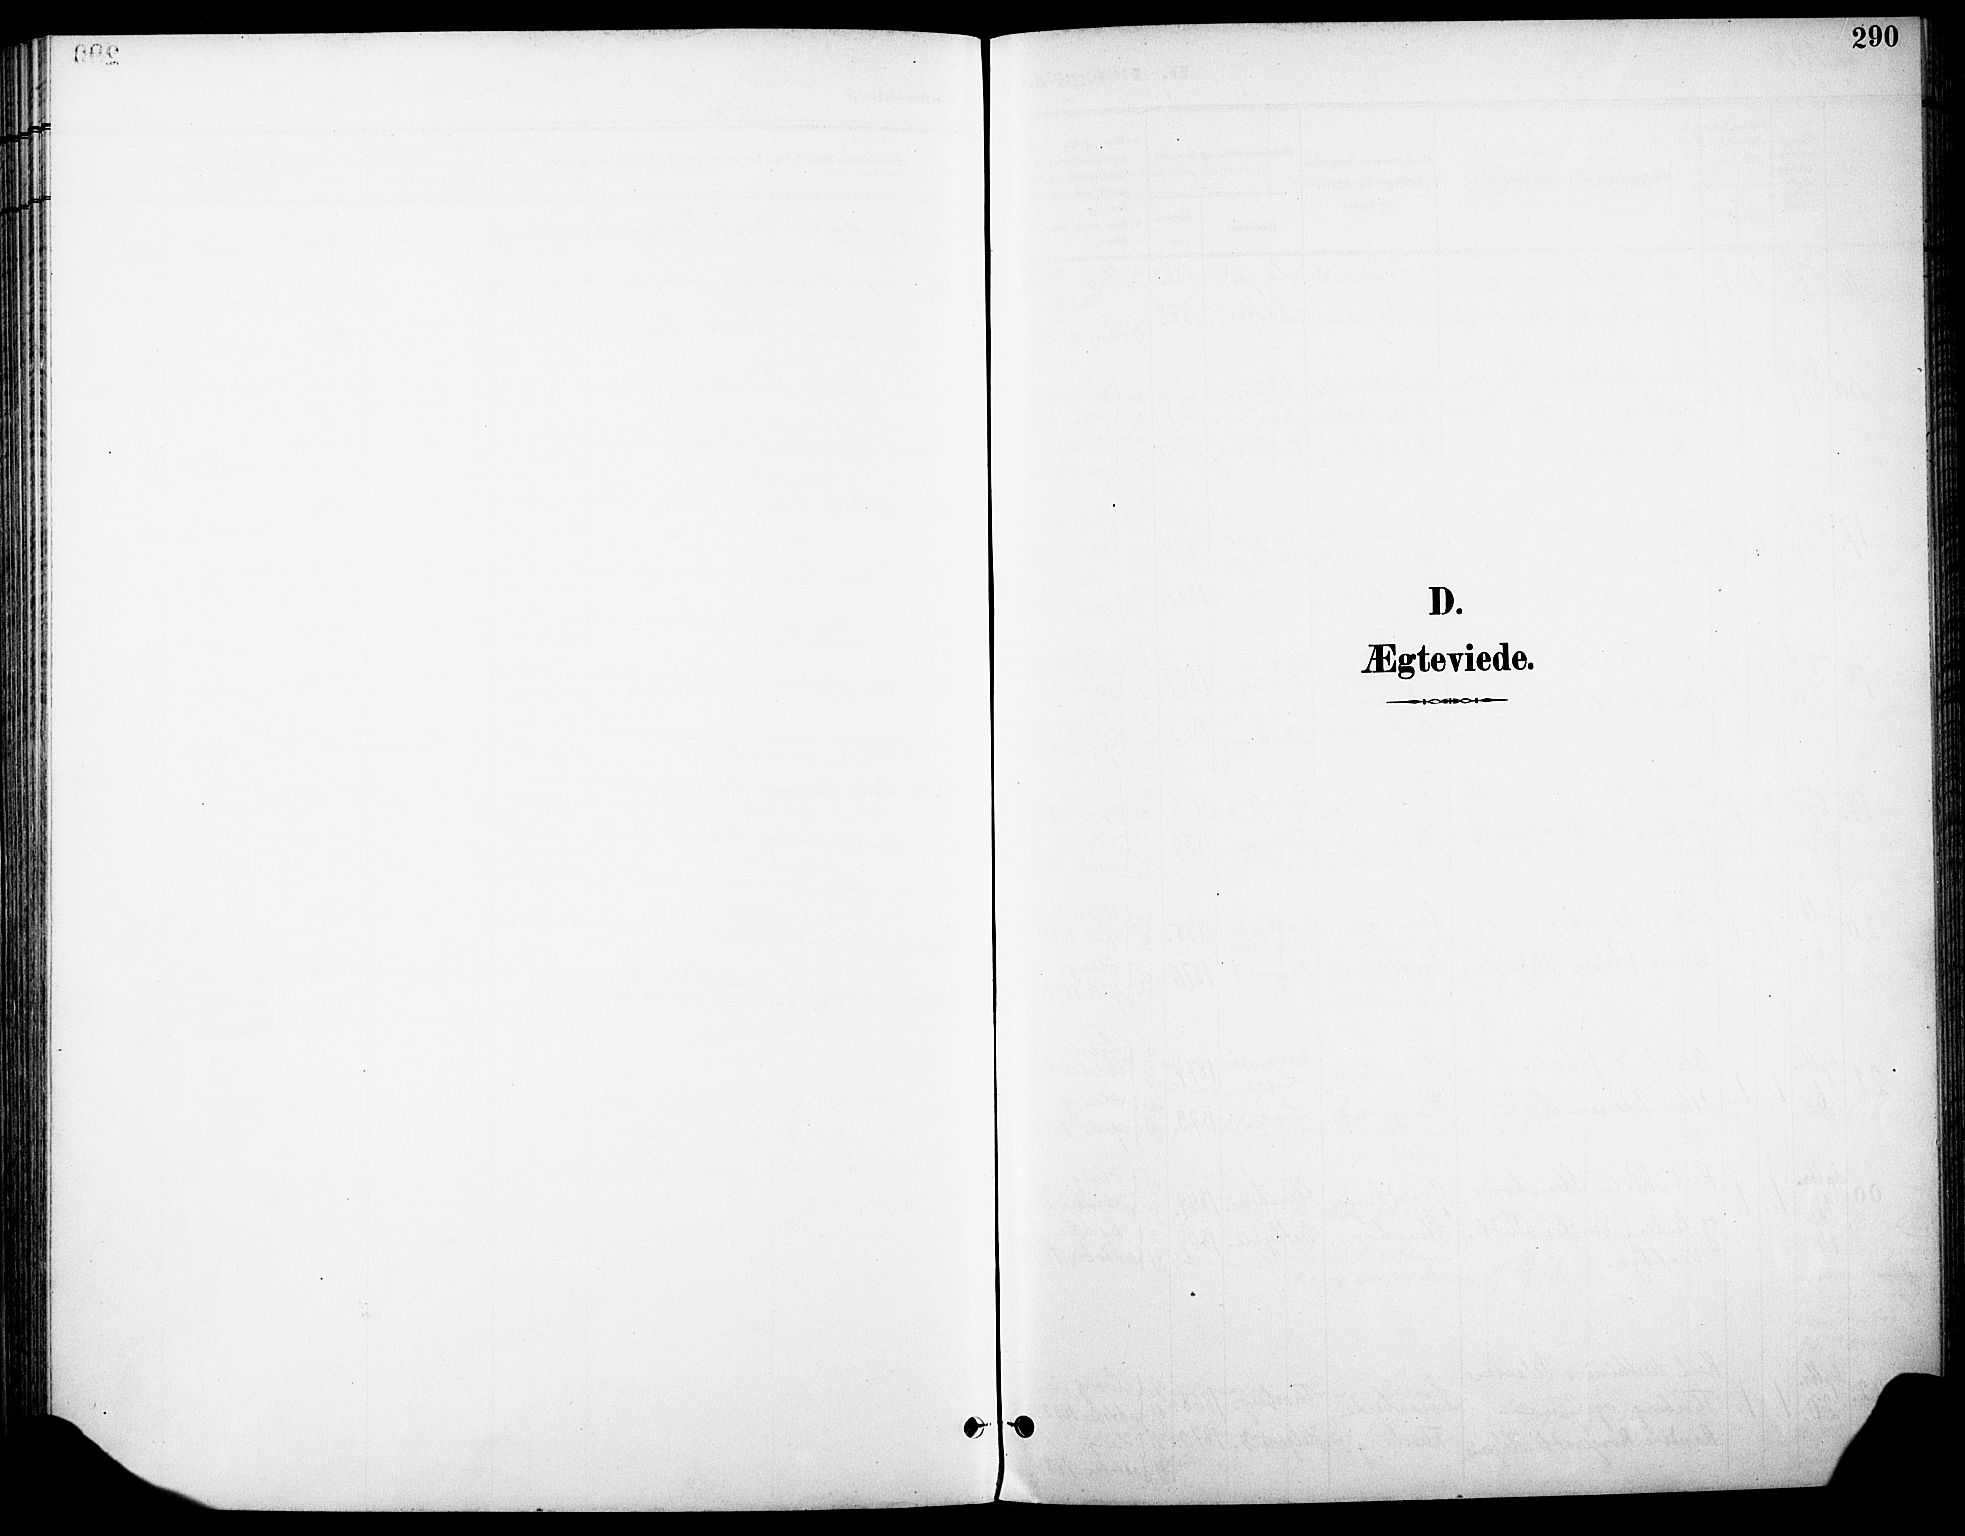 SAKO, Eiker kirkebøker, F/Fb/L0003: Ministerialbok nr. II 3, 1896-1942, s. 290